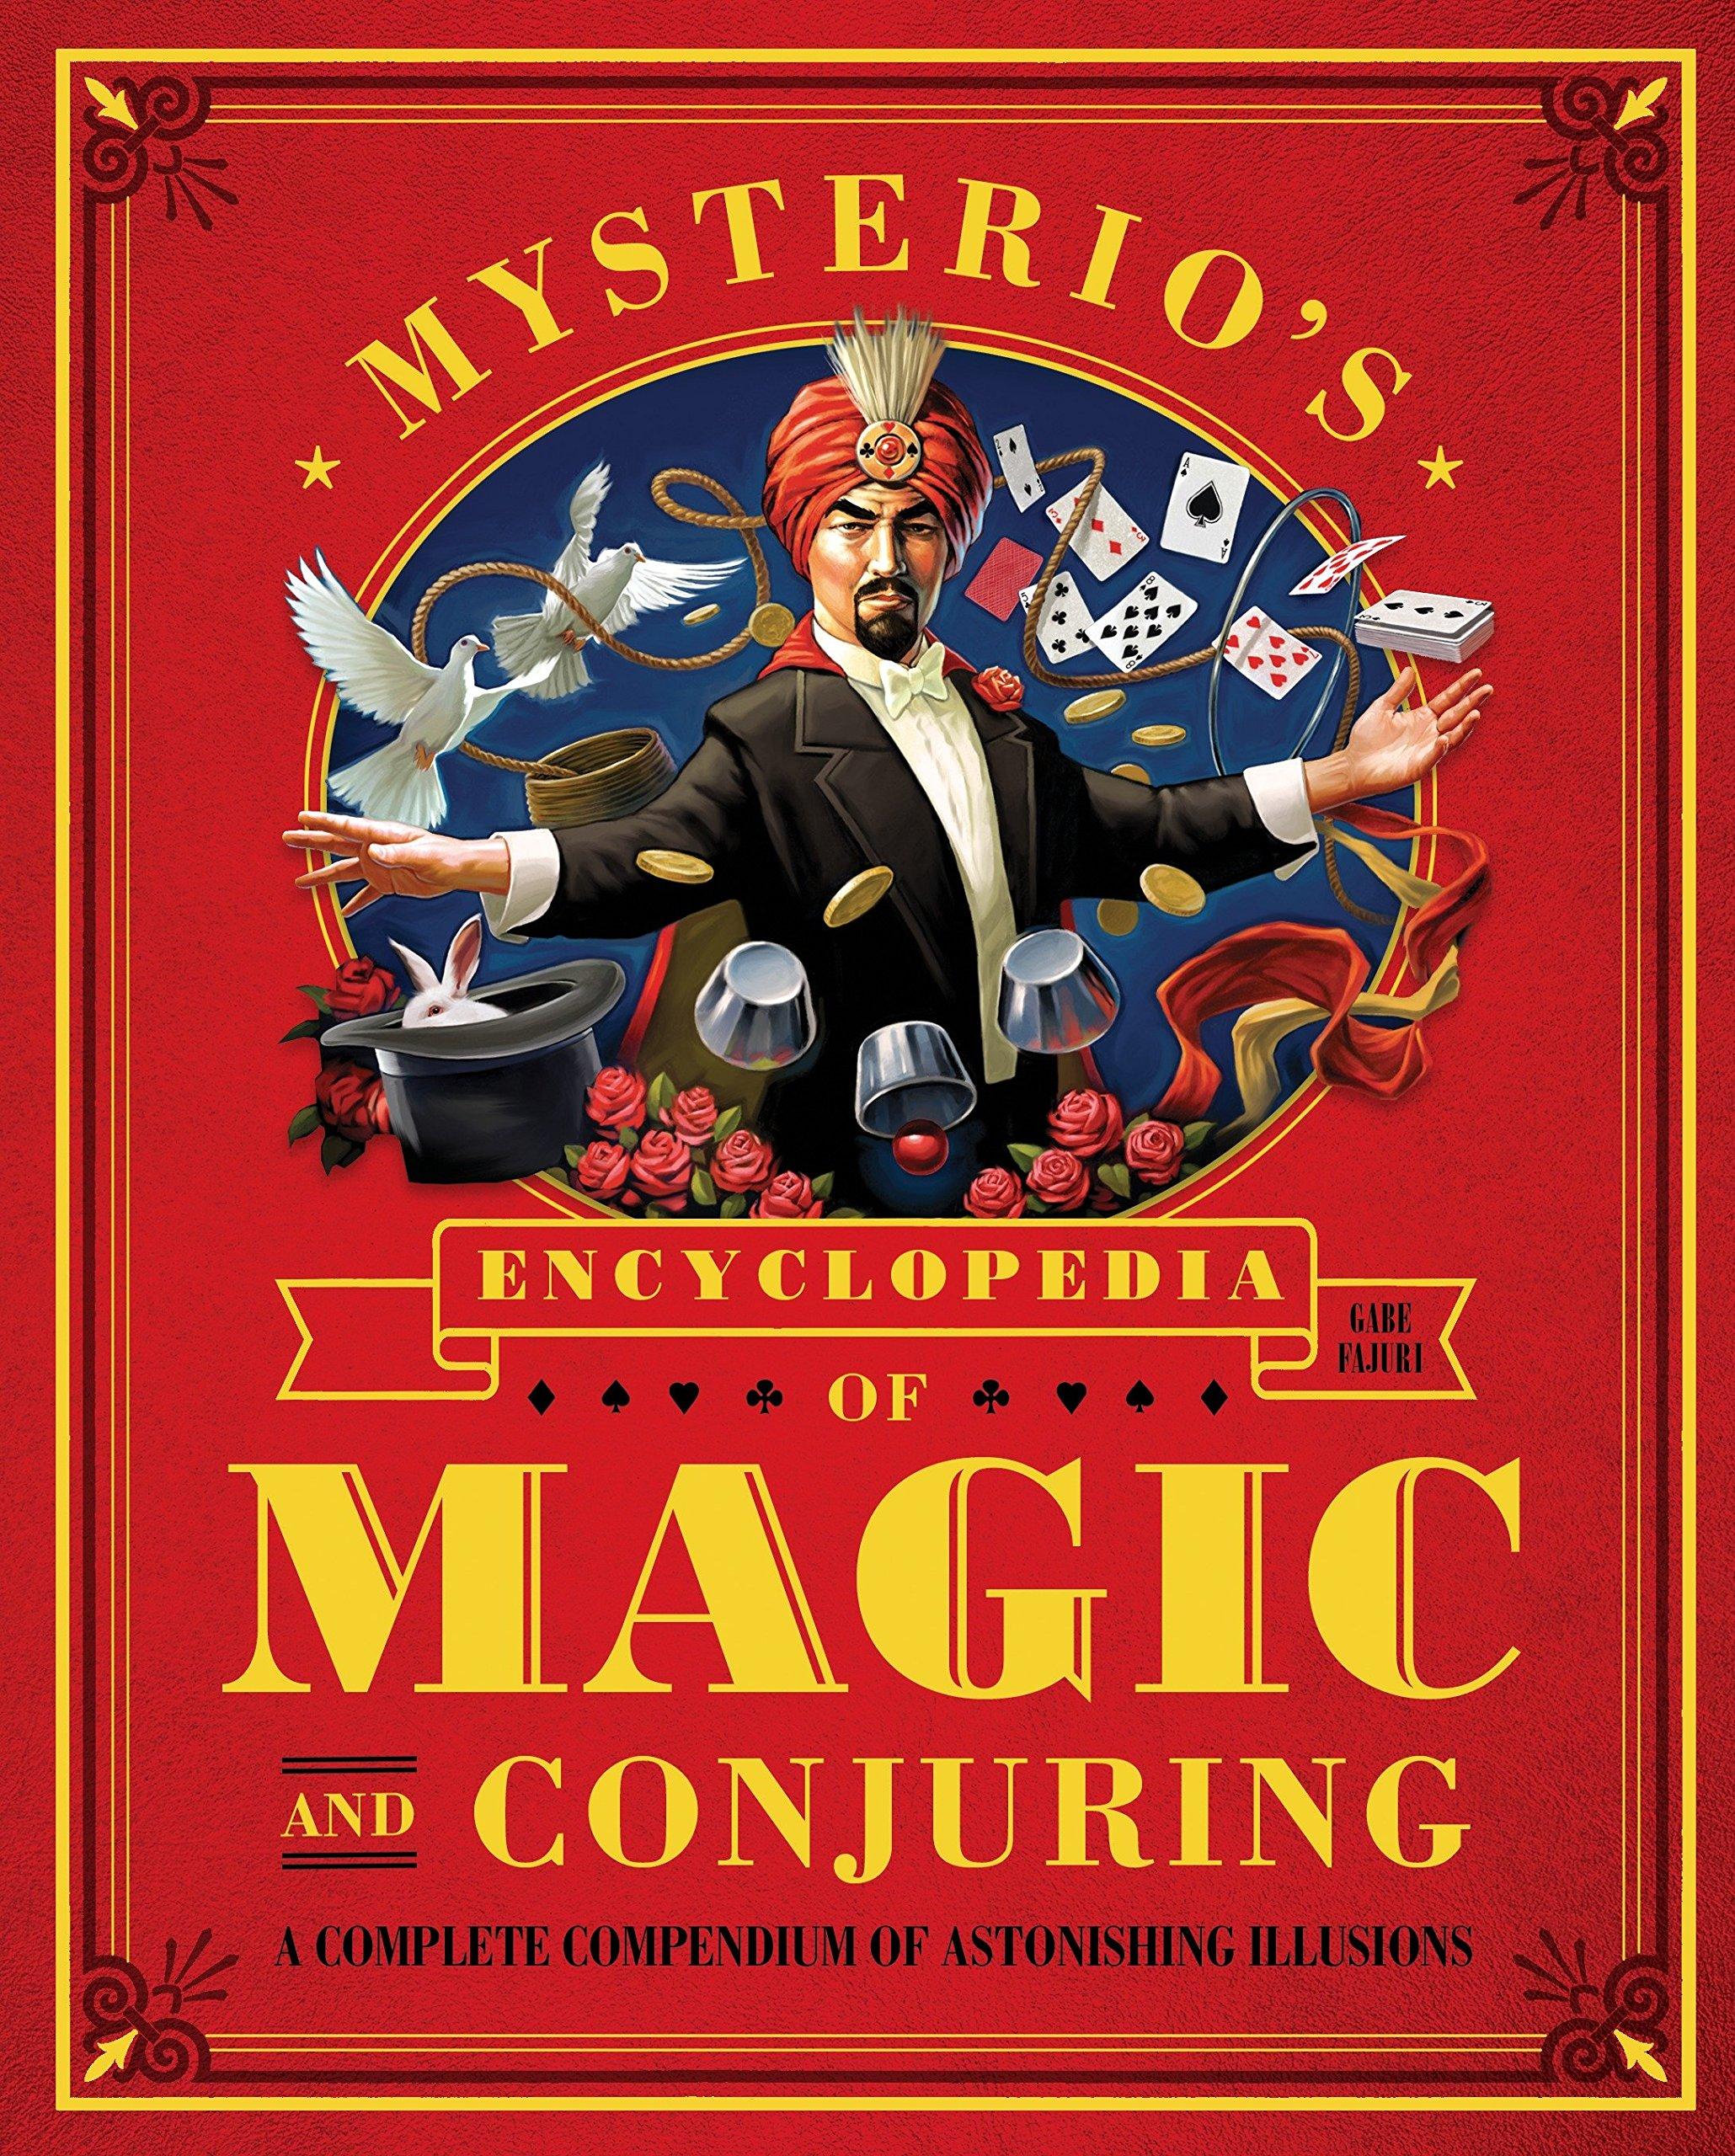 Mysterio's Encyclopedia of Magic and Conjuring: A Complete Compendium of  Astonishing Illusions: Gabe Fajuri: 9781594744969: Amazon.com: Books